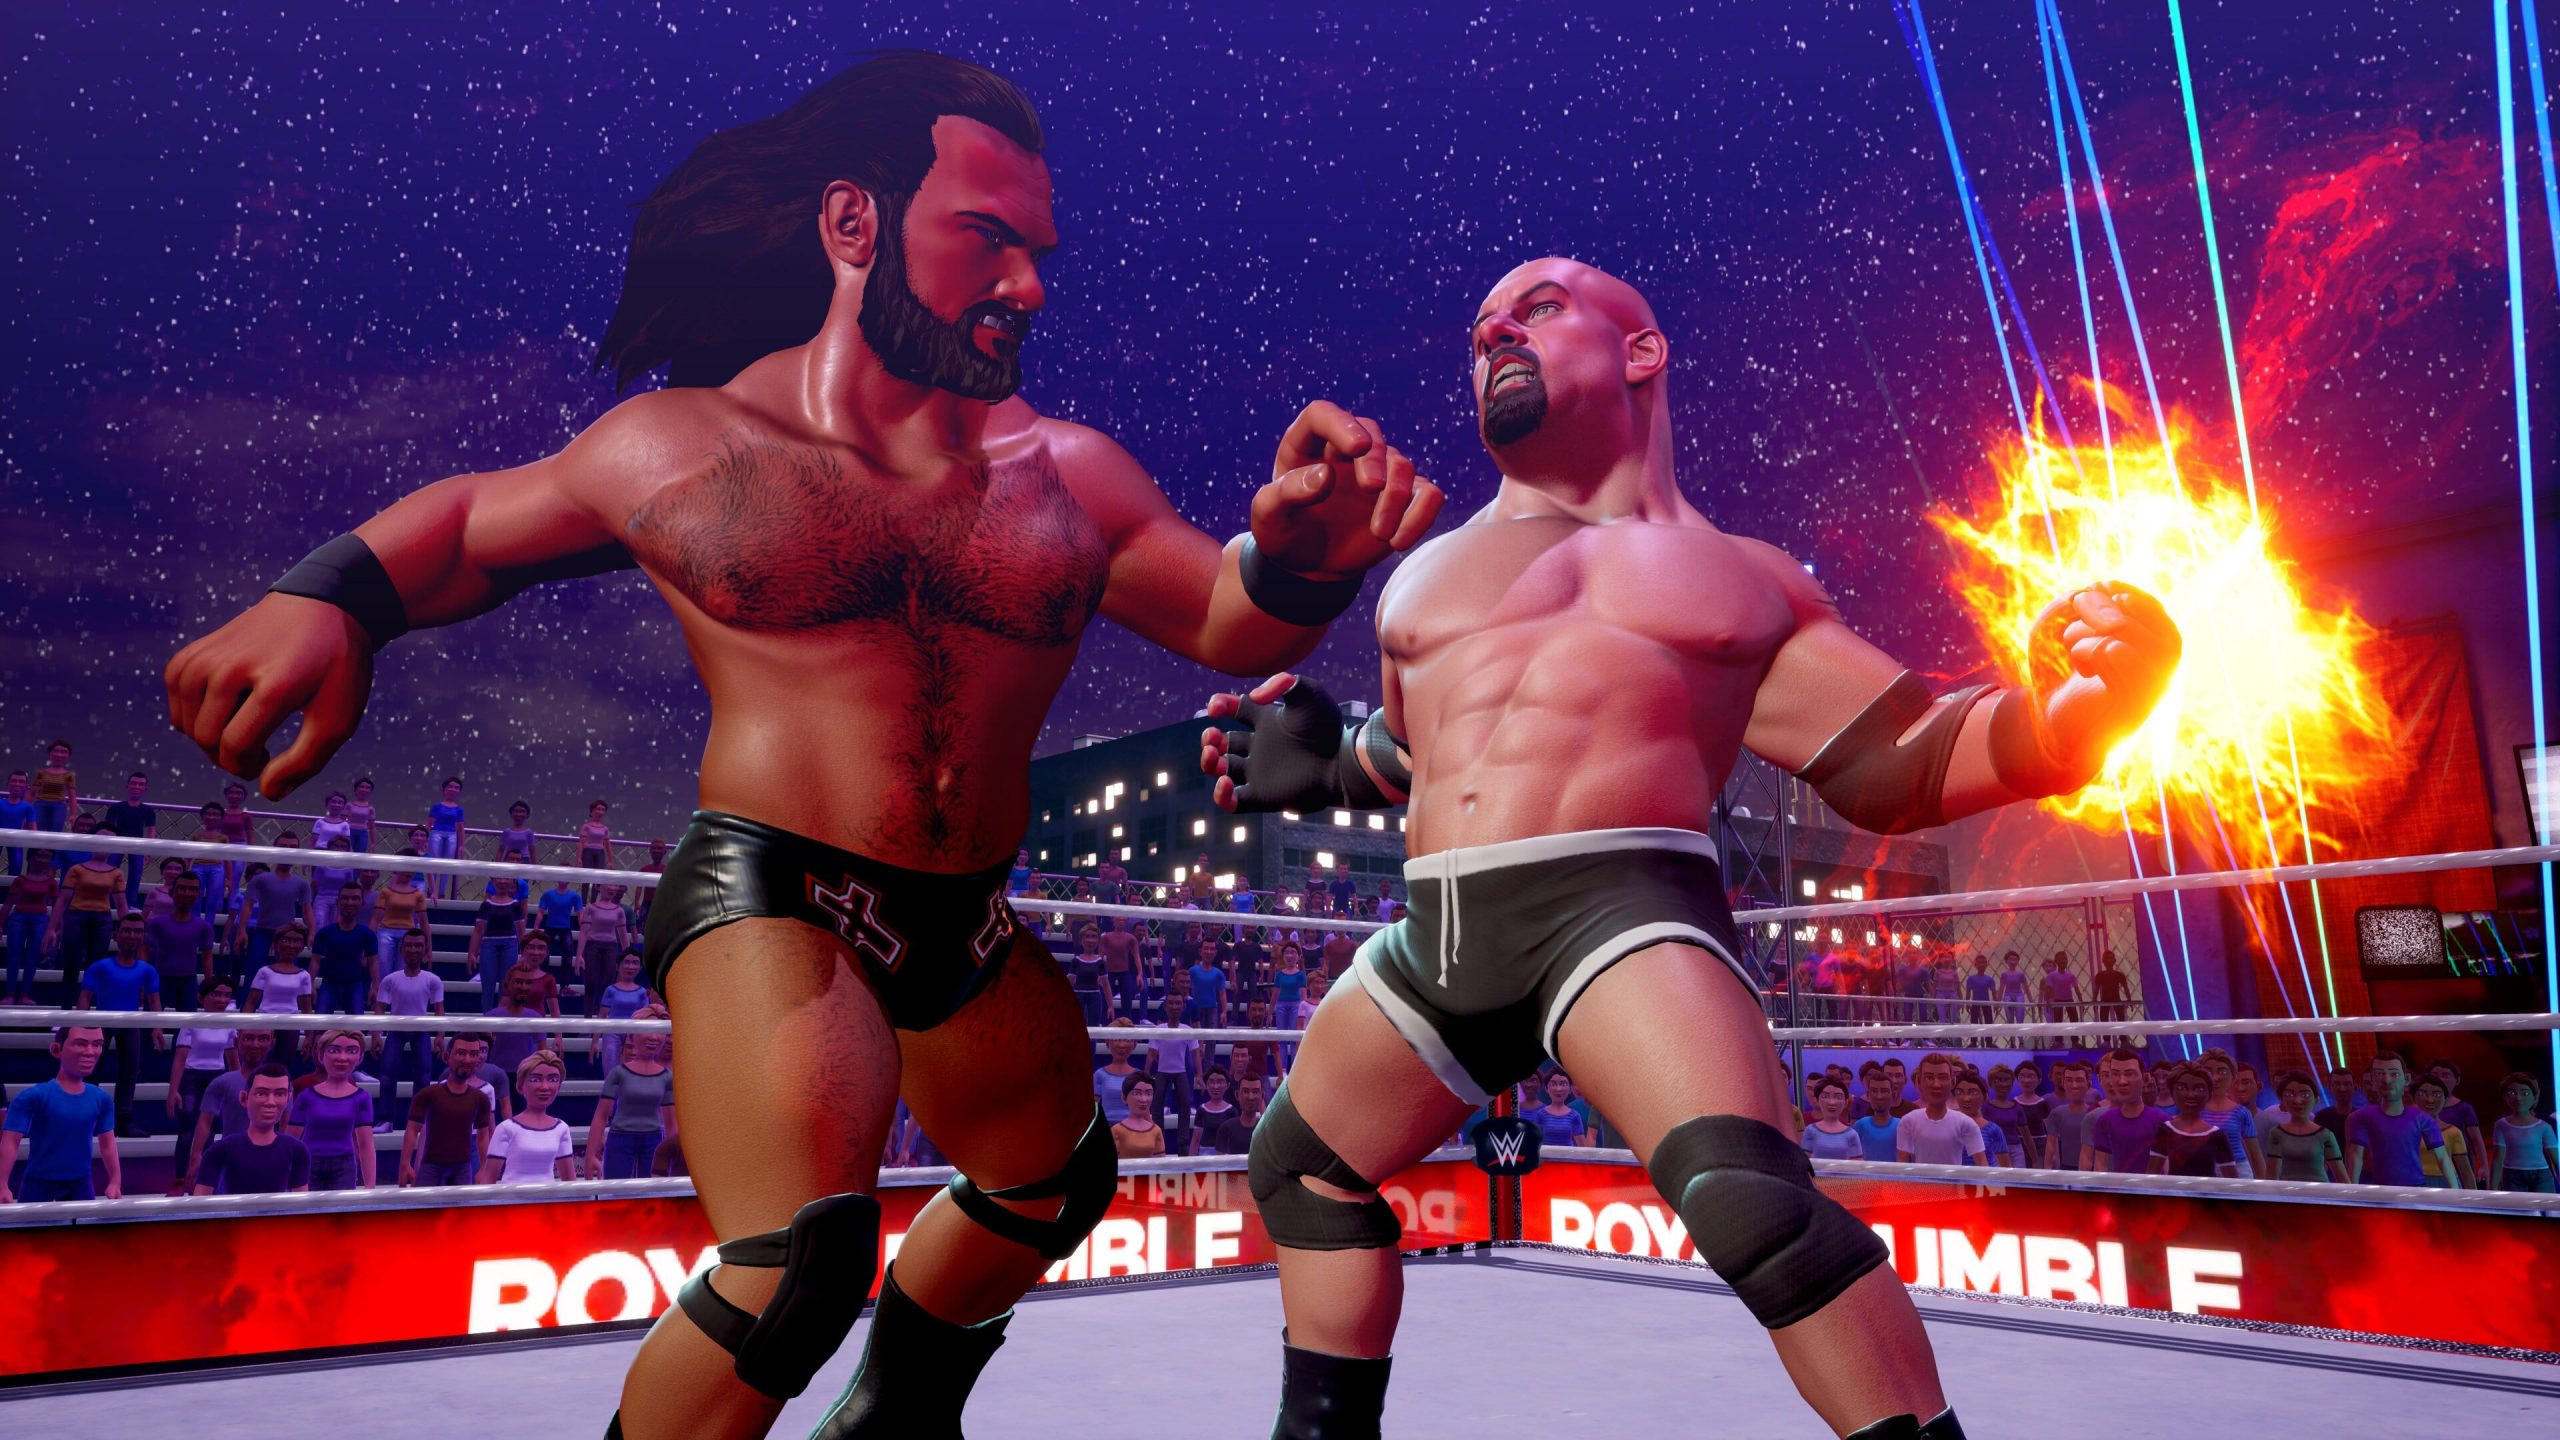 WWE Royal Rumble 2021 Predictions - WWE 2K Battlegrounds style!